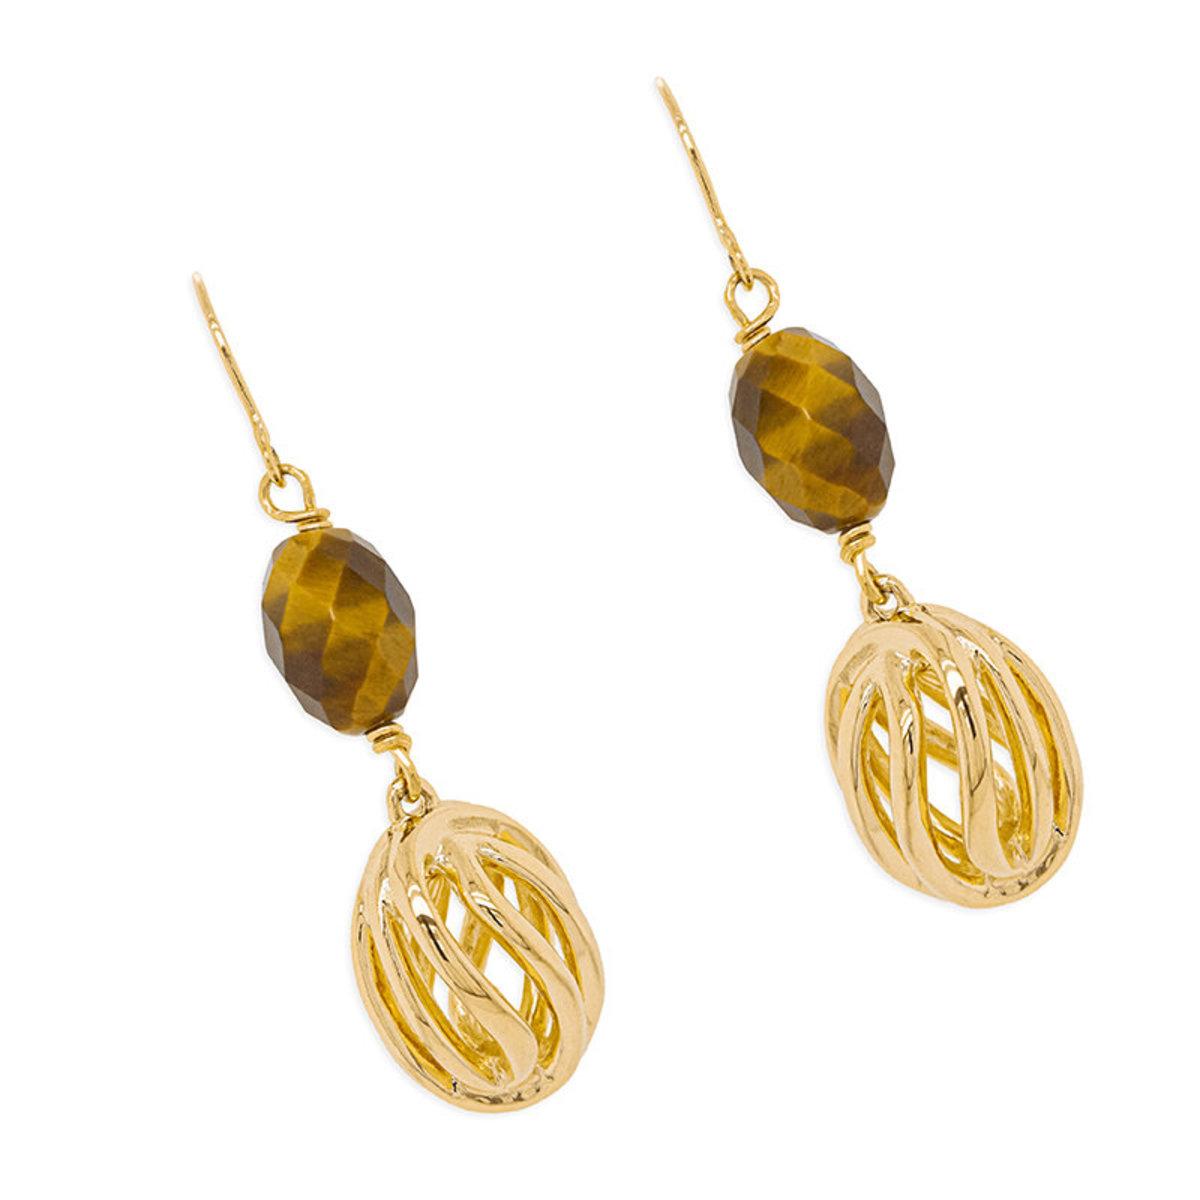 Natura bracelet: gold plating, tiger eye fish hook earrnings